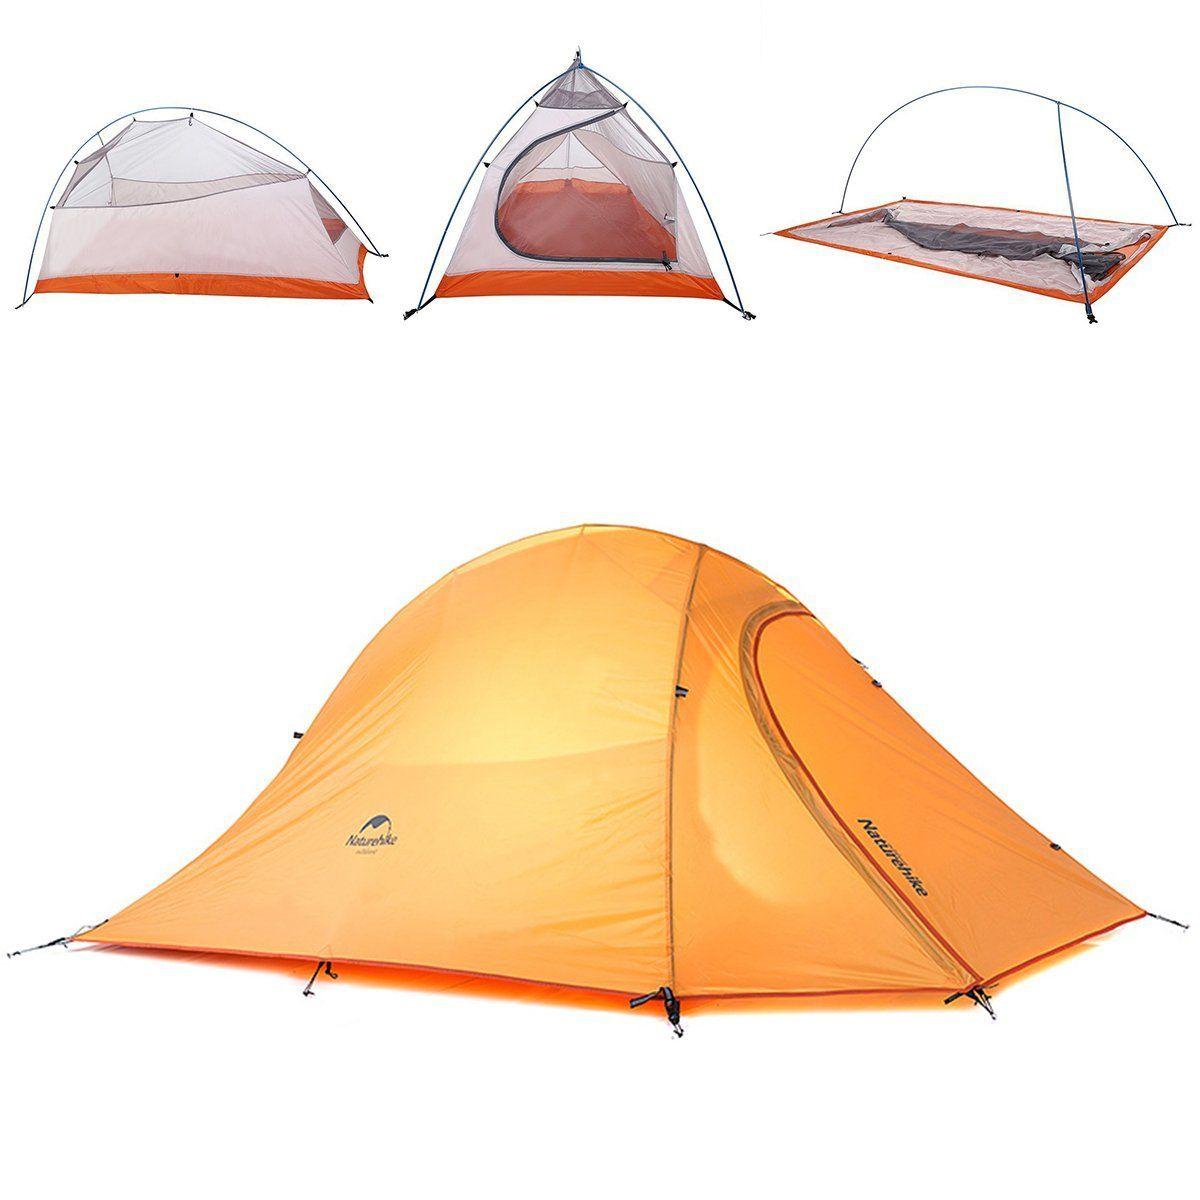 VINQLIQ 2  3 Person 4 Seasons Lightweight Waterproof Anti-UV Windproof Double Layer Backpacking · Backpacking TentHiking TentOutdoor GearTents Hunting  sc 1 st  Pinterest & VINQLIQ 2  3 Person 4 Seasons Lightweight Waterproof Anti-UV ...